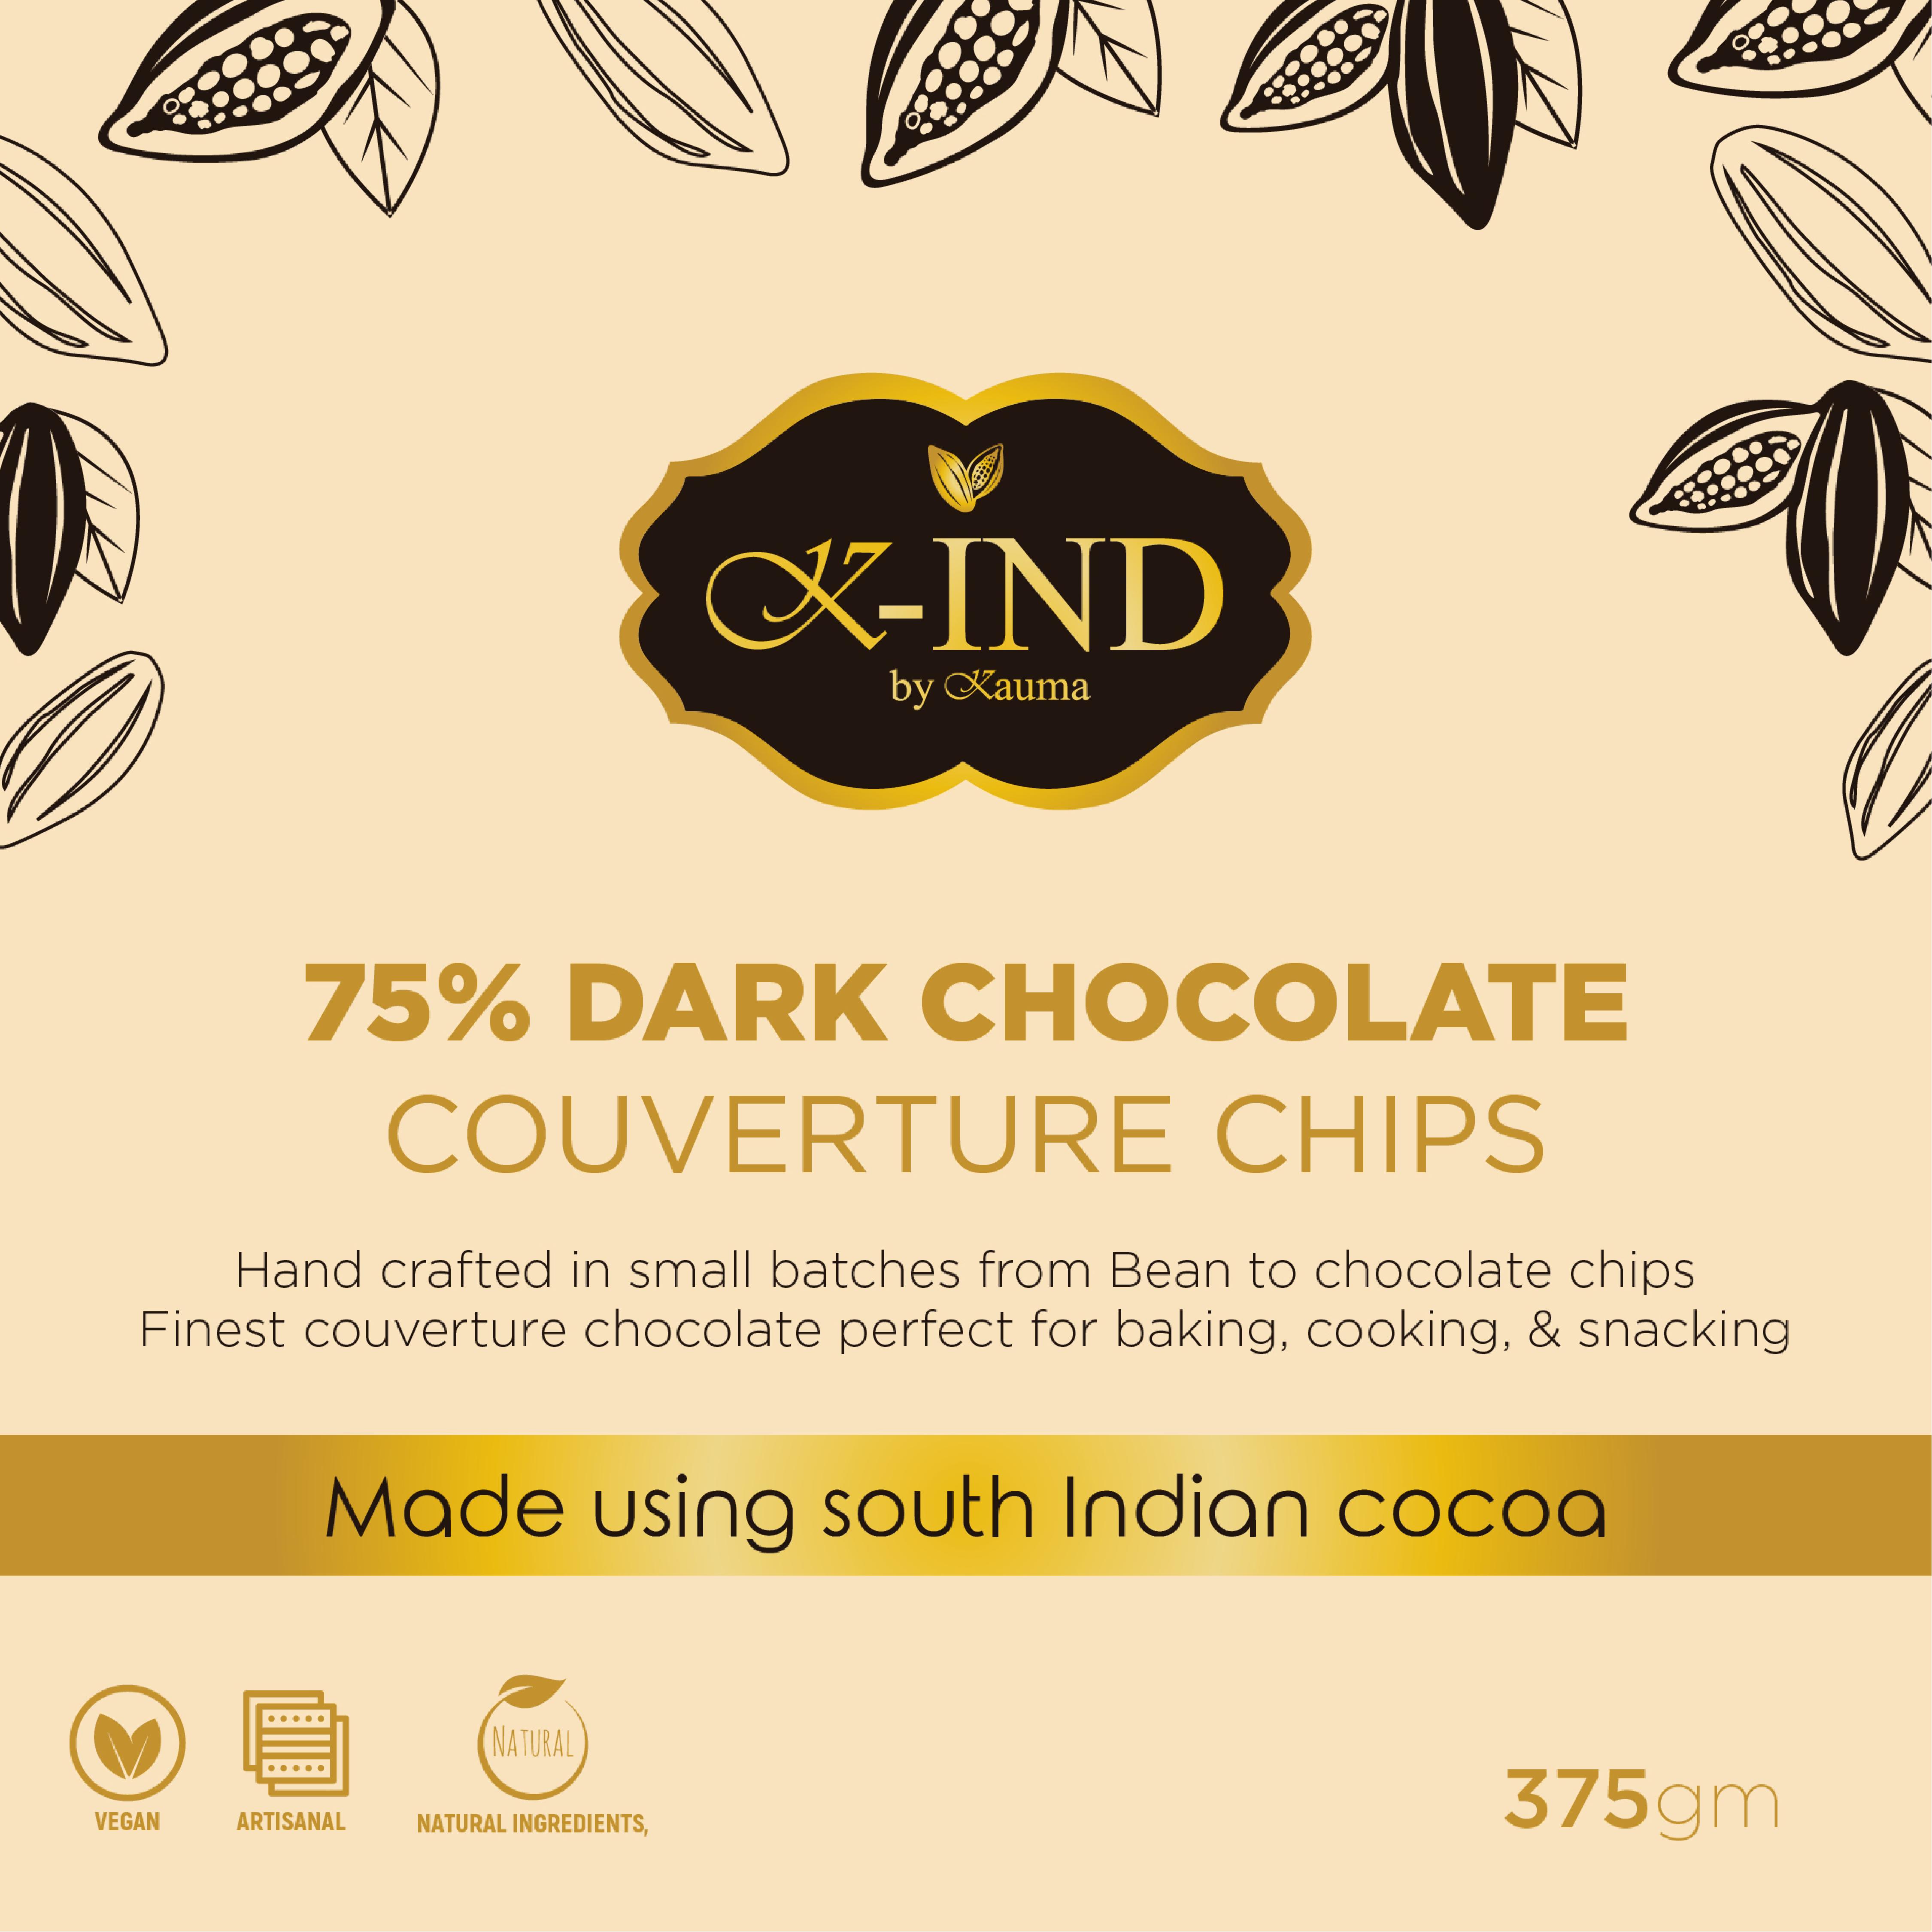 Kauma-75%-Dark-Chocolate-Couverture-Chips-new(375gm)